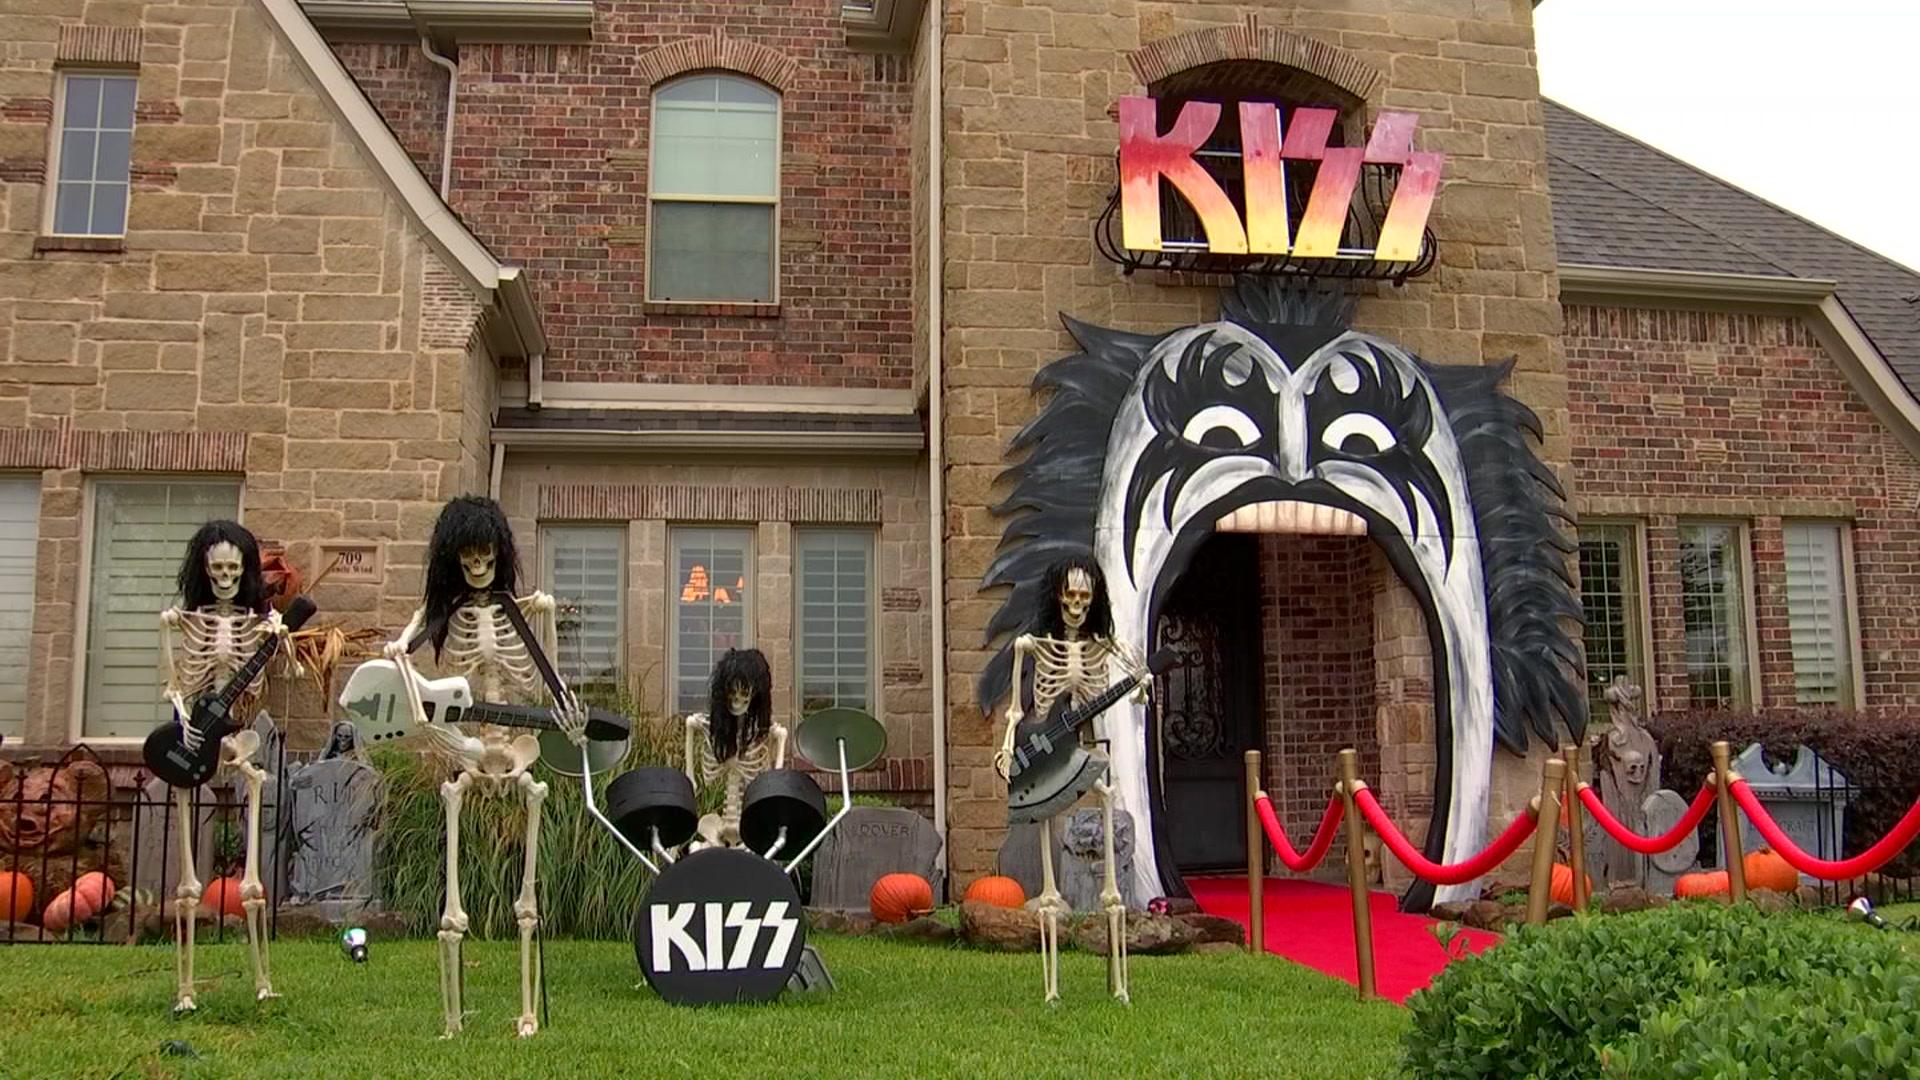 Halloween 2020 Keller Texas An Epic Halloween House in Keller Turns Heads Every Year – NBC 5